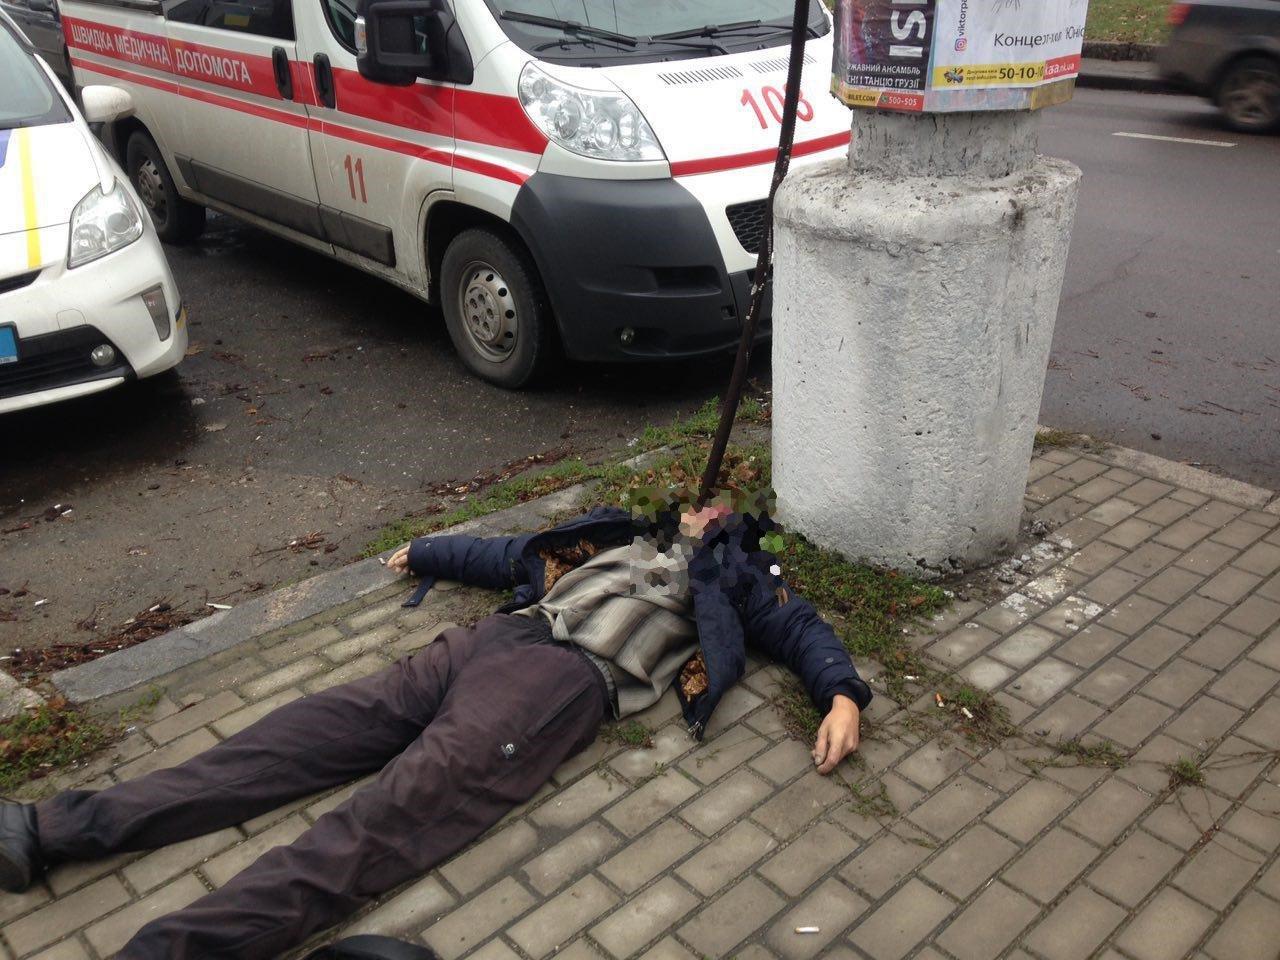 Возле Пушкинского кольца в Николаеве найден труп мужчины, - ФОТО, фото-1